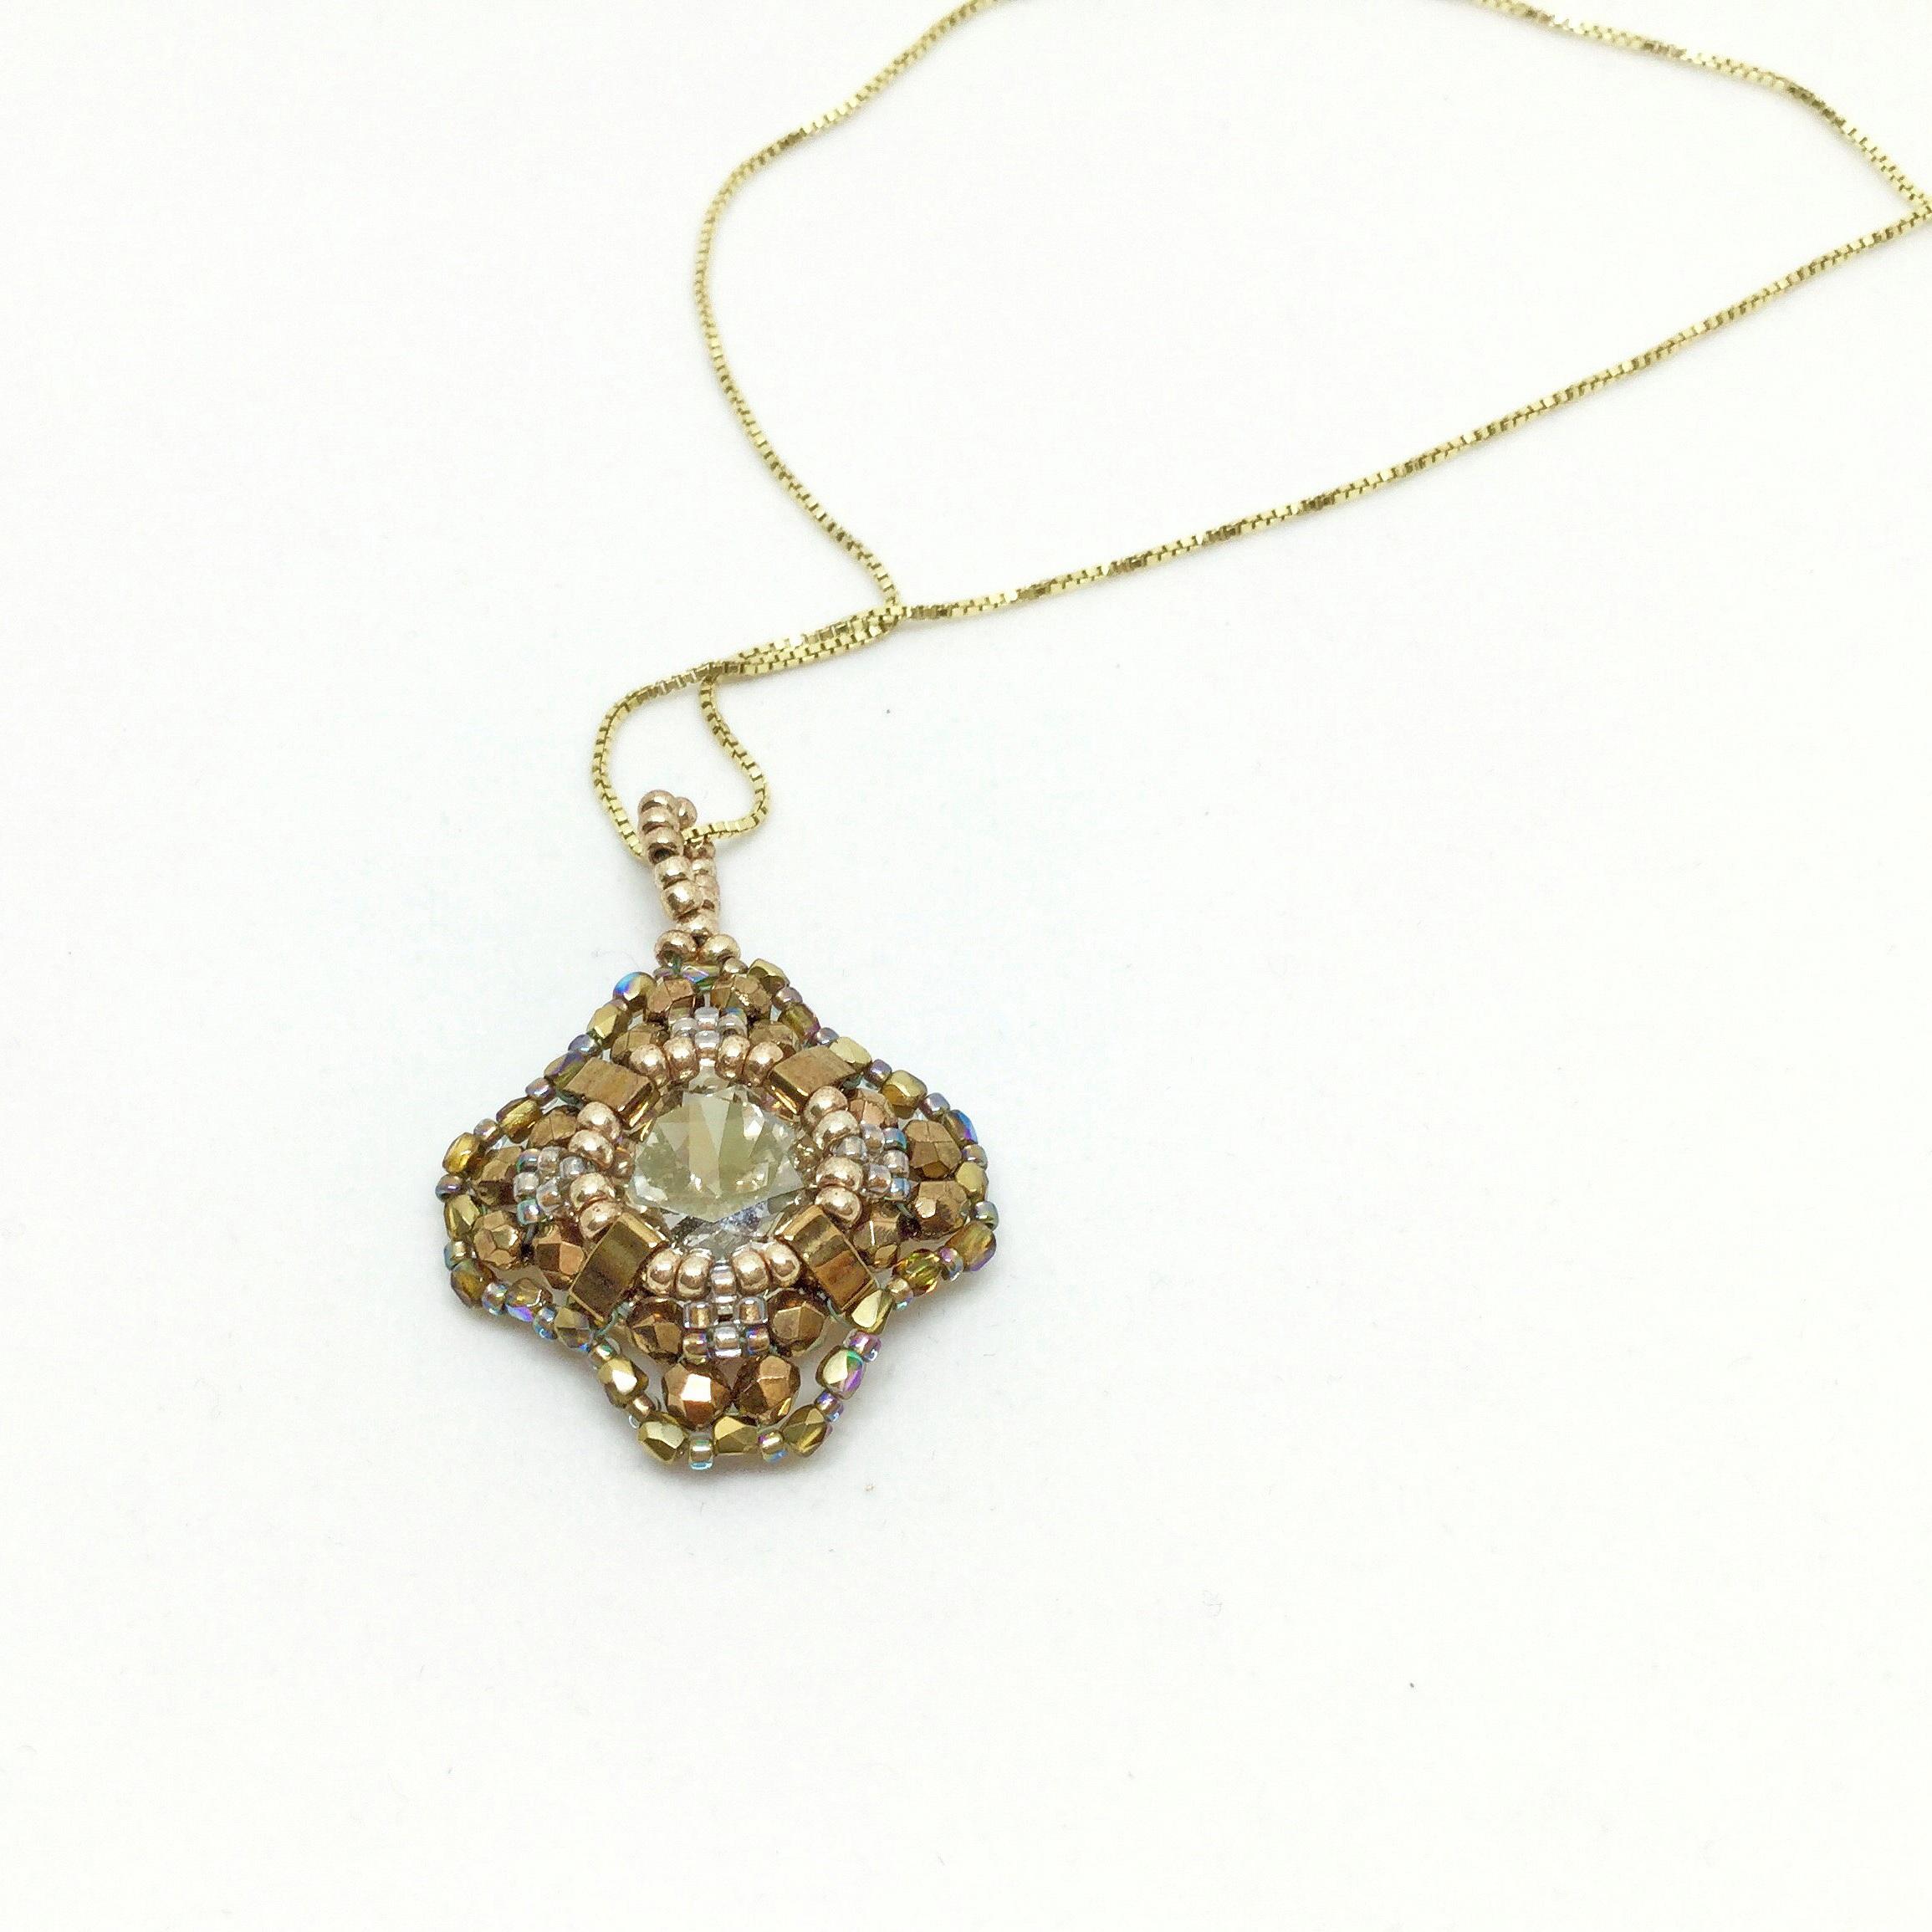 JL Marie Jewelry